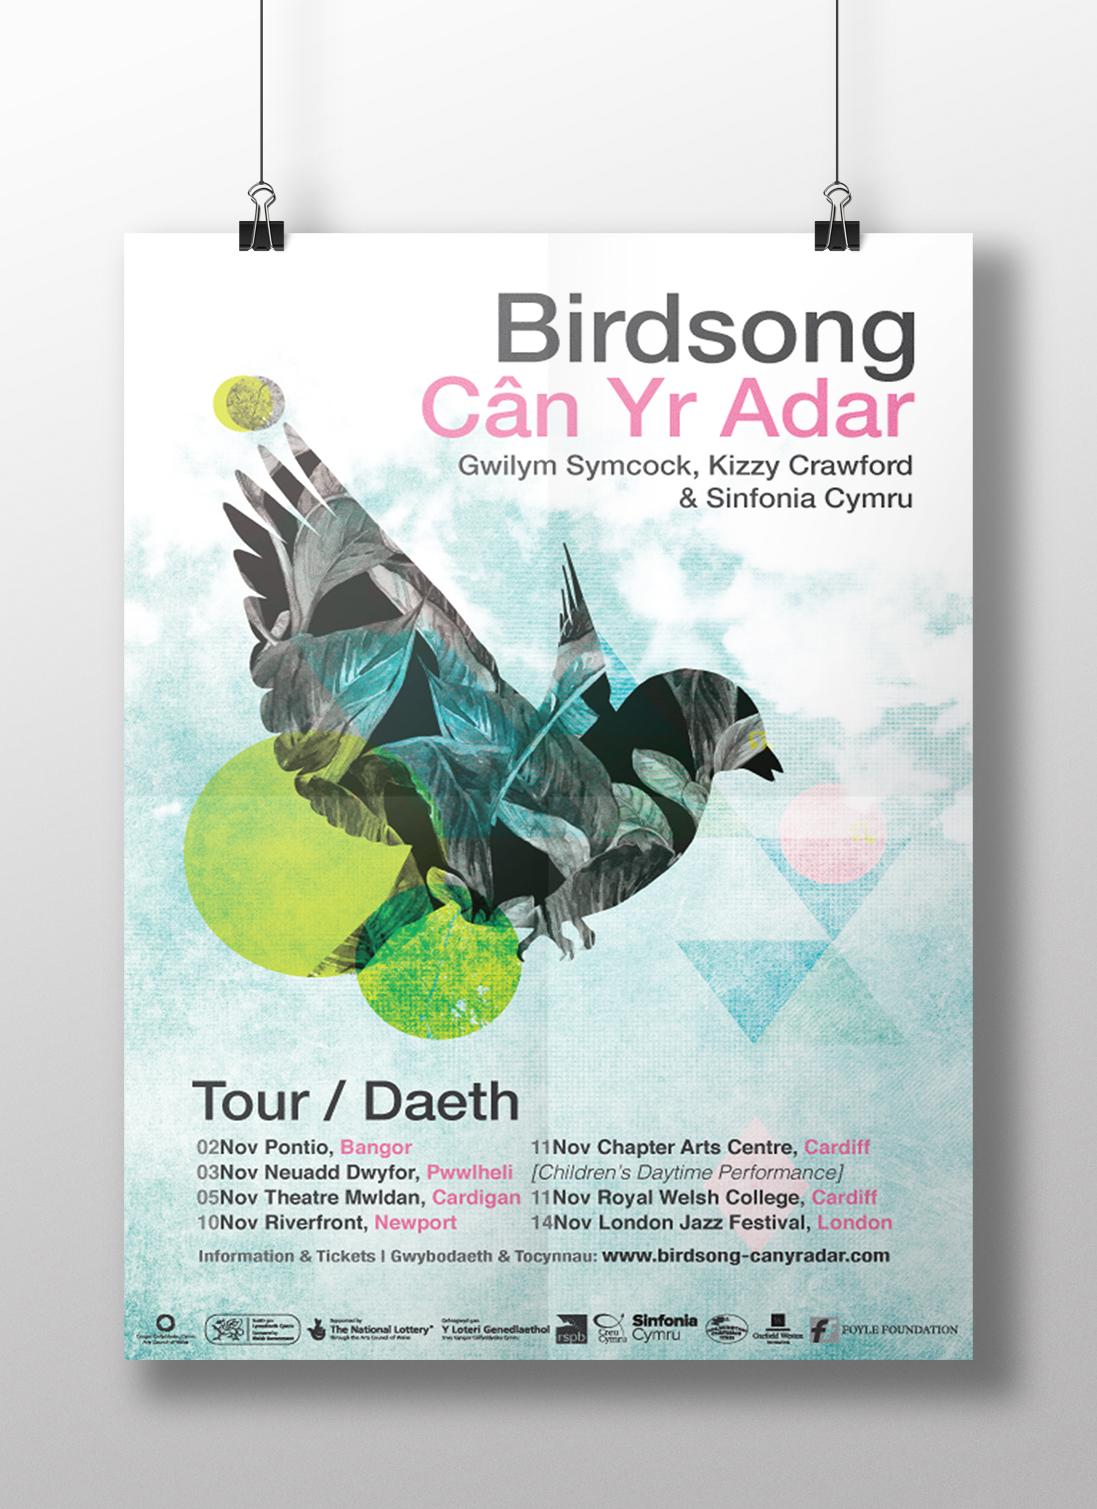 Birdsong tour poster_mockup_MD.jpg